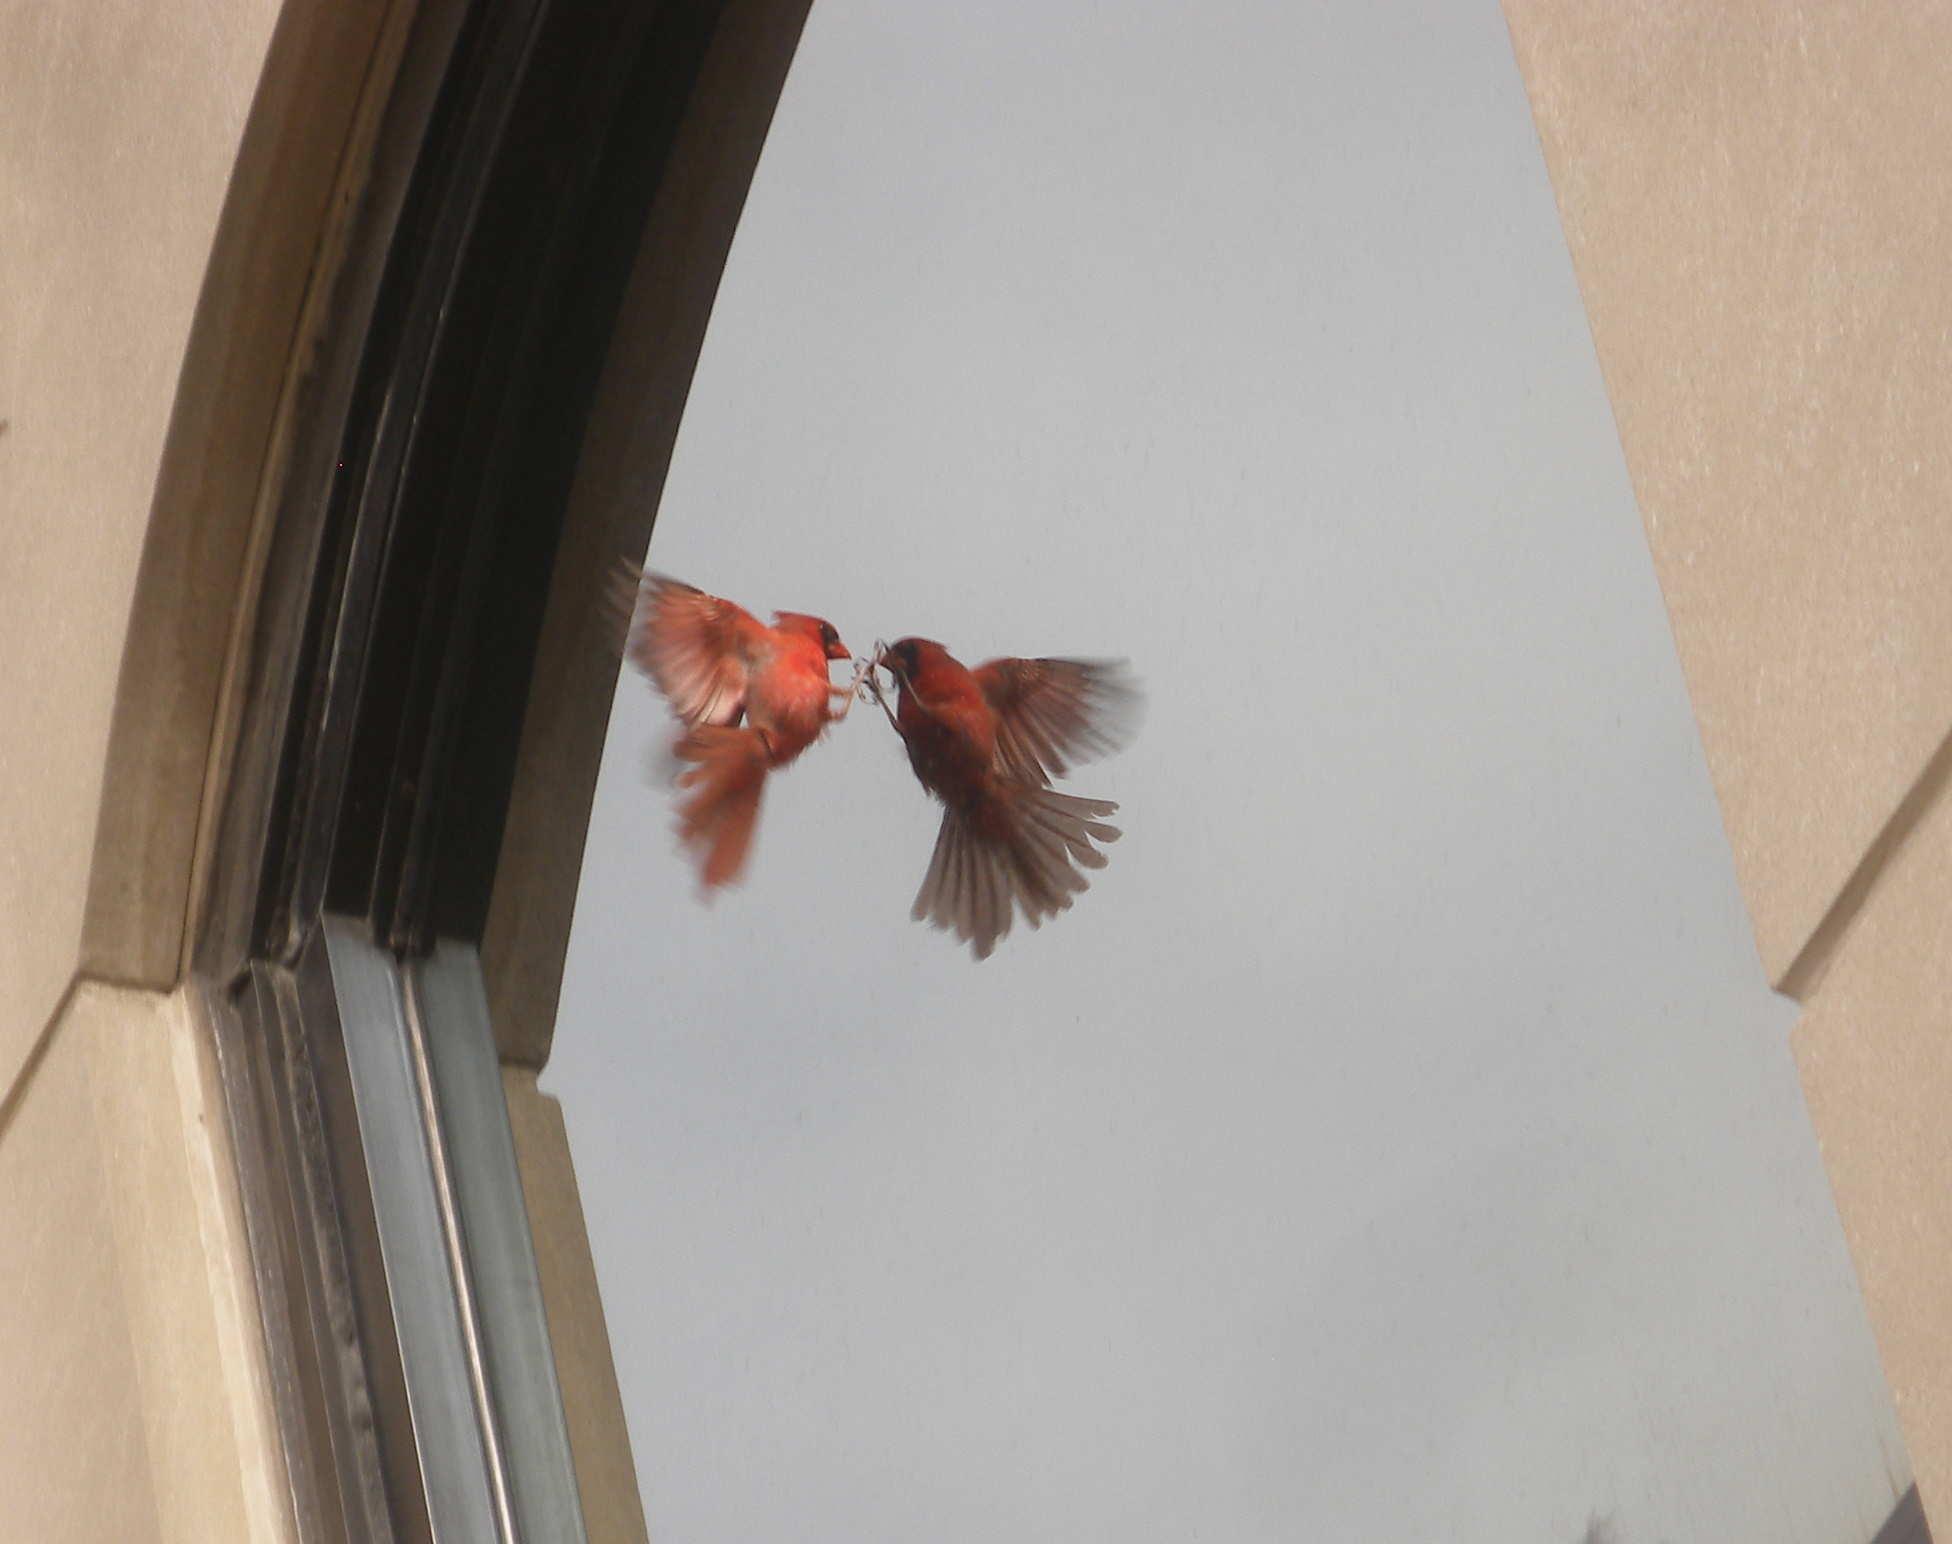 Photo courtesy CBCM (http://www.birdmonitors.net/)